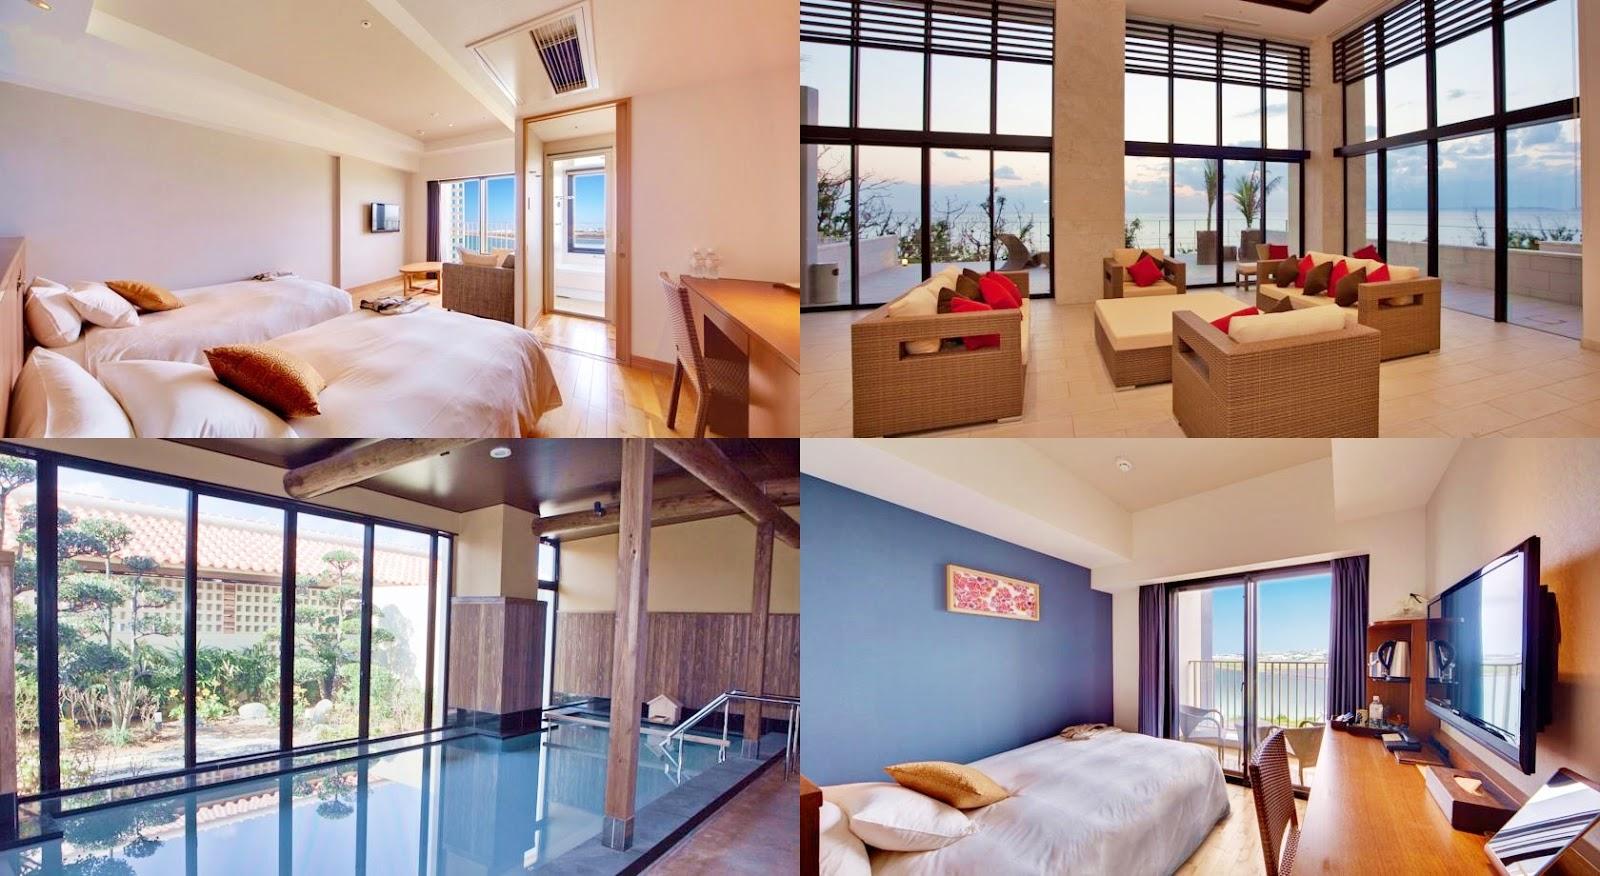 沖繩-住宿-推薦-琉球溫泉瀨長島酒店-Ryukyu-Onsen-Senagajima-Hotel-Okinawa-hotel-recommendation